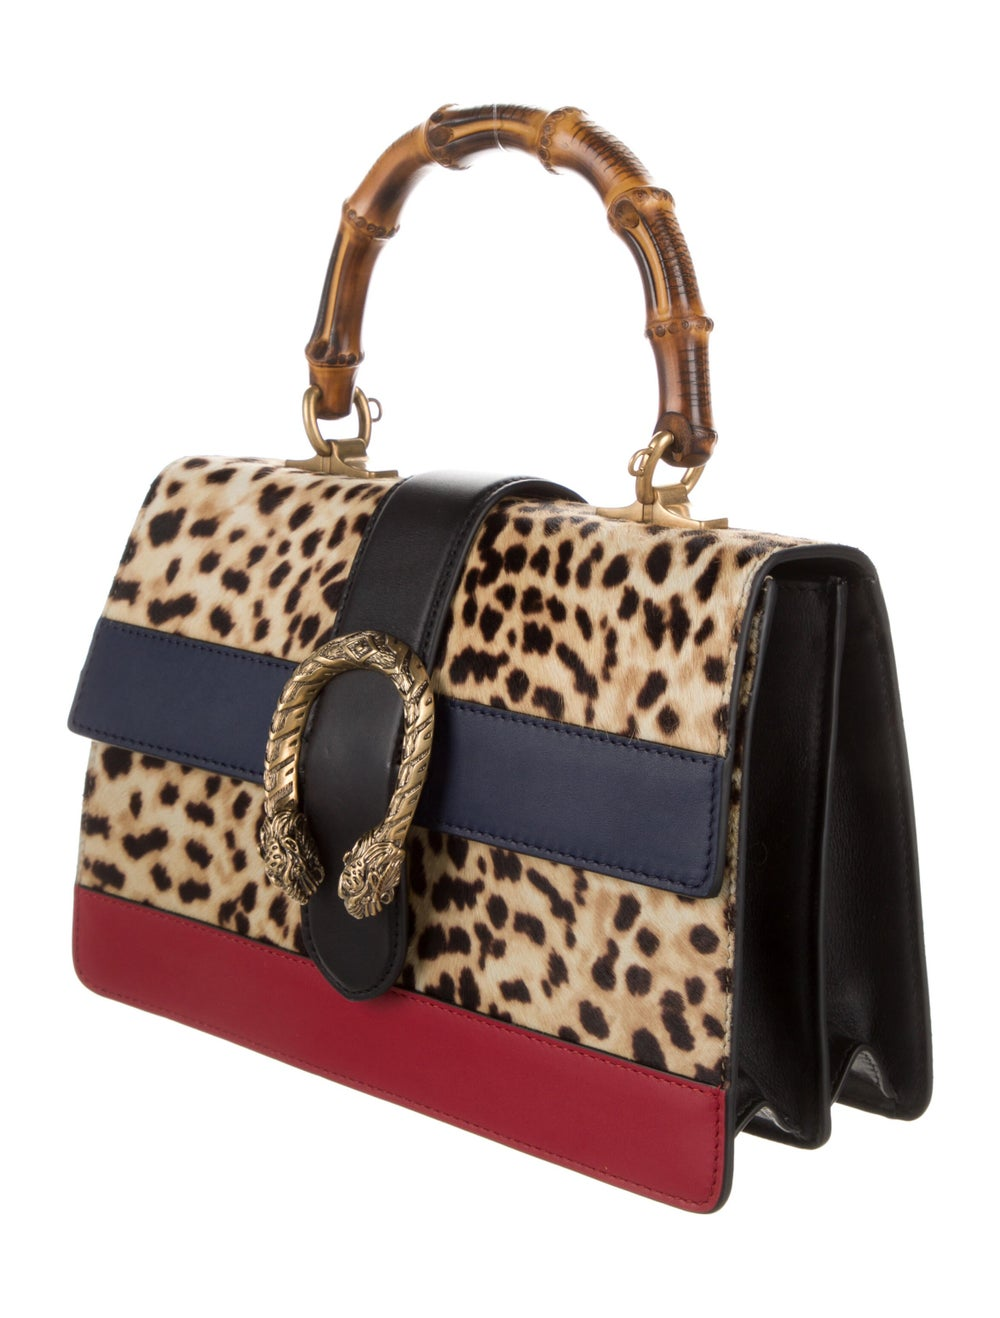 Gucci Dionysus Bamboo Top Handle Bag Gold - image 3